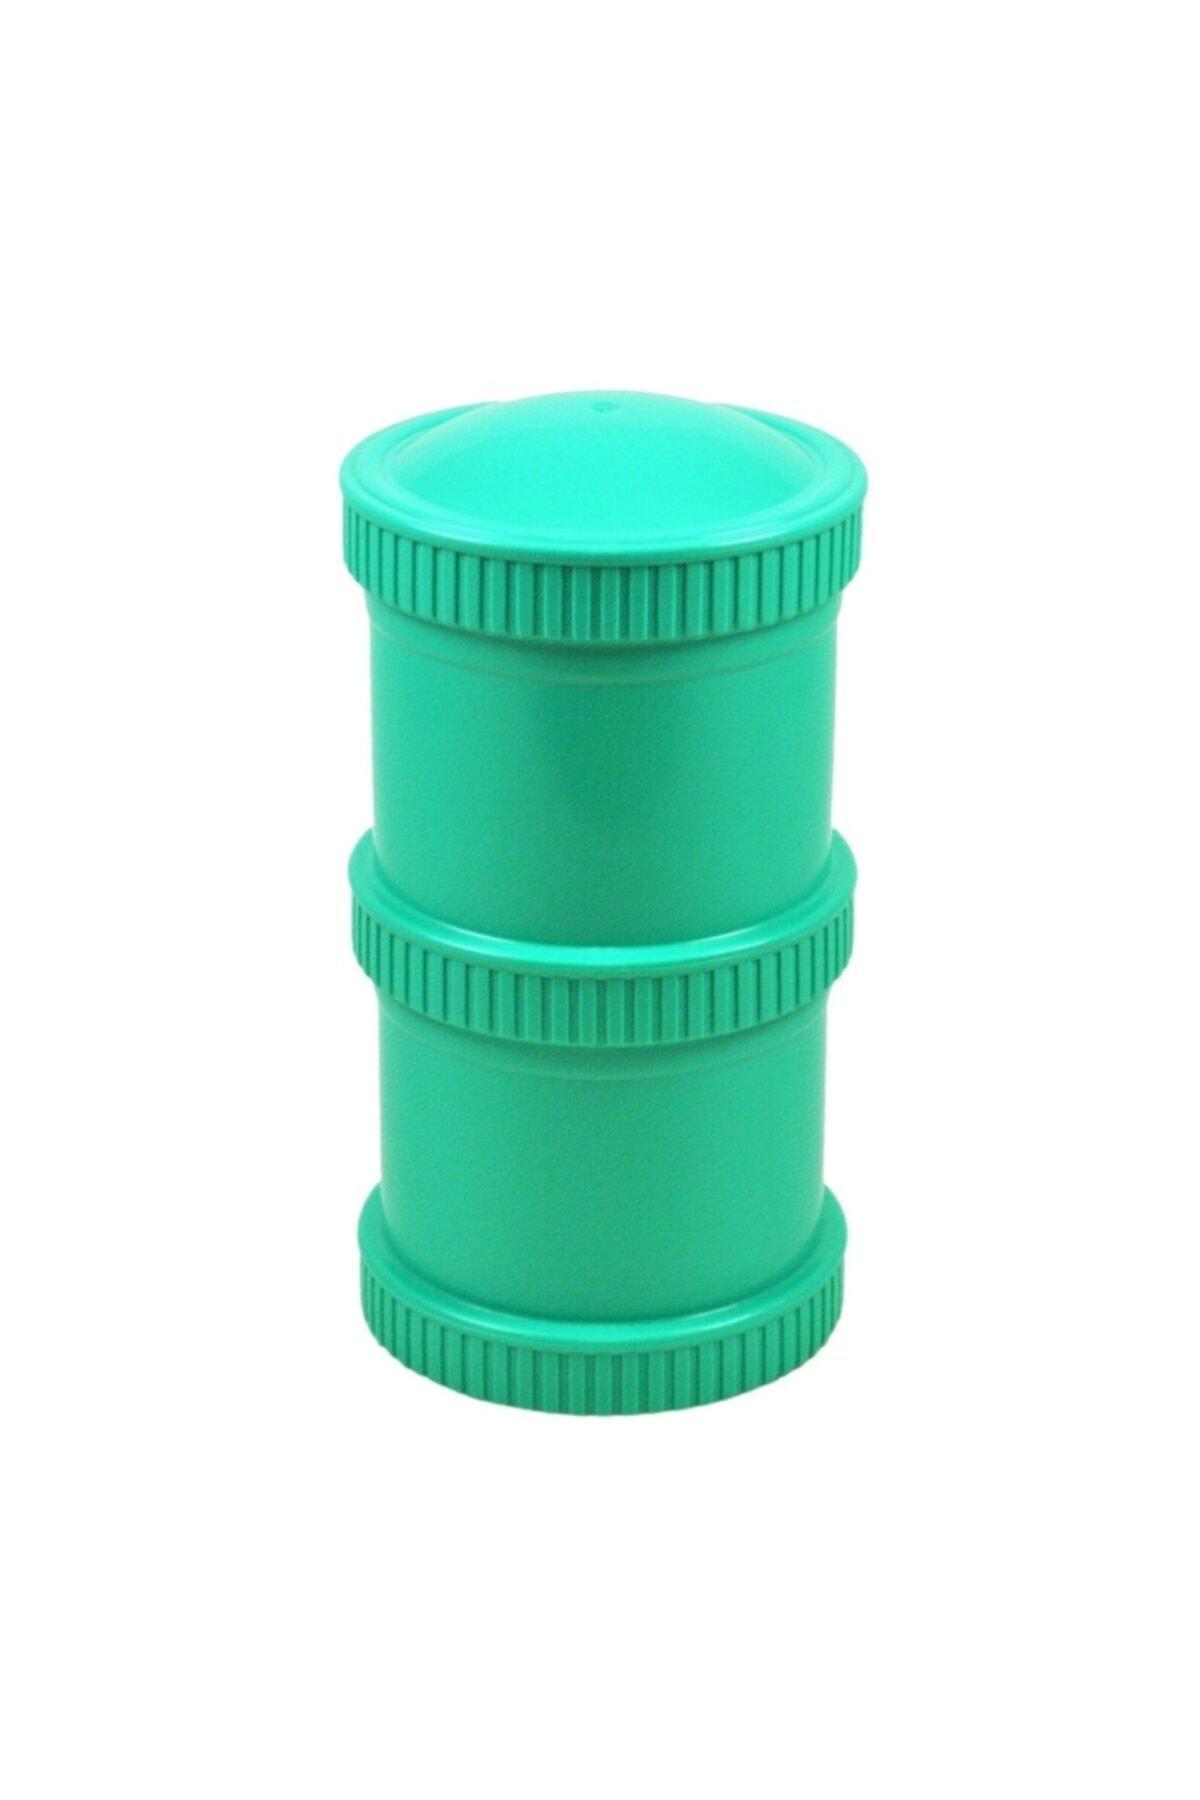 Replay Çift Katlı Saklama Kabı - Su Yeşili 2